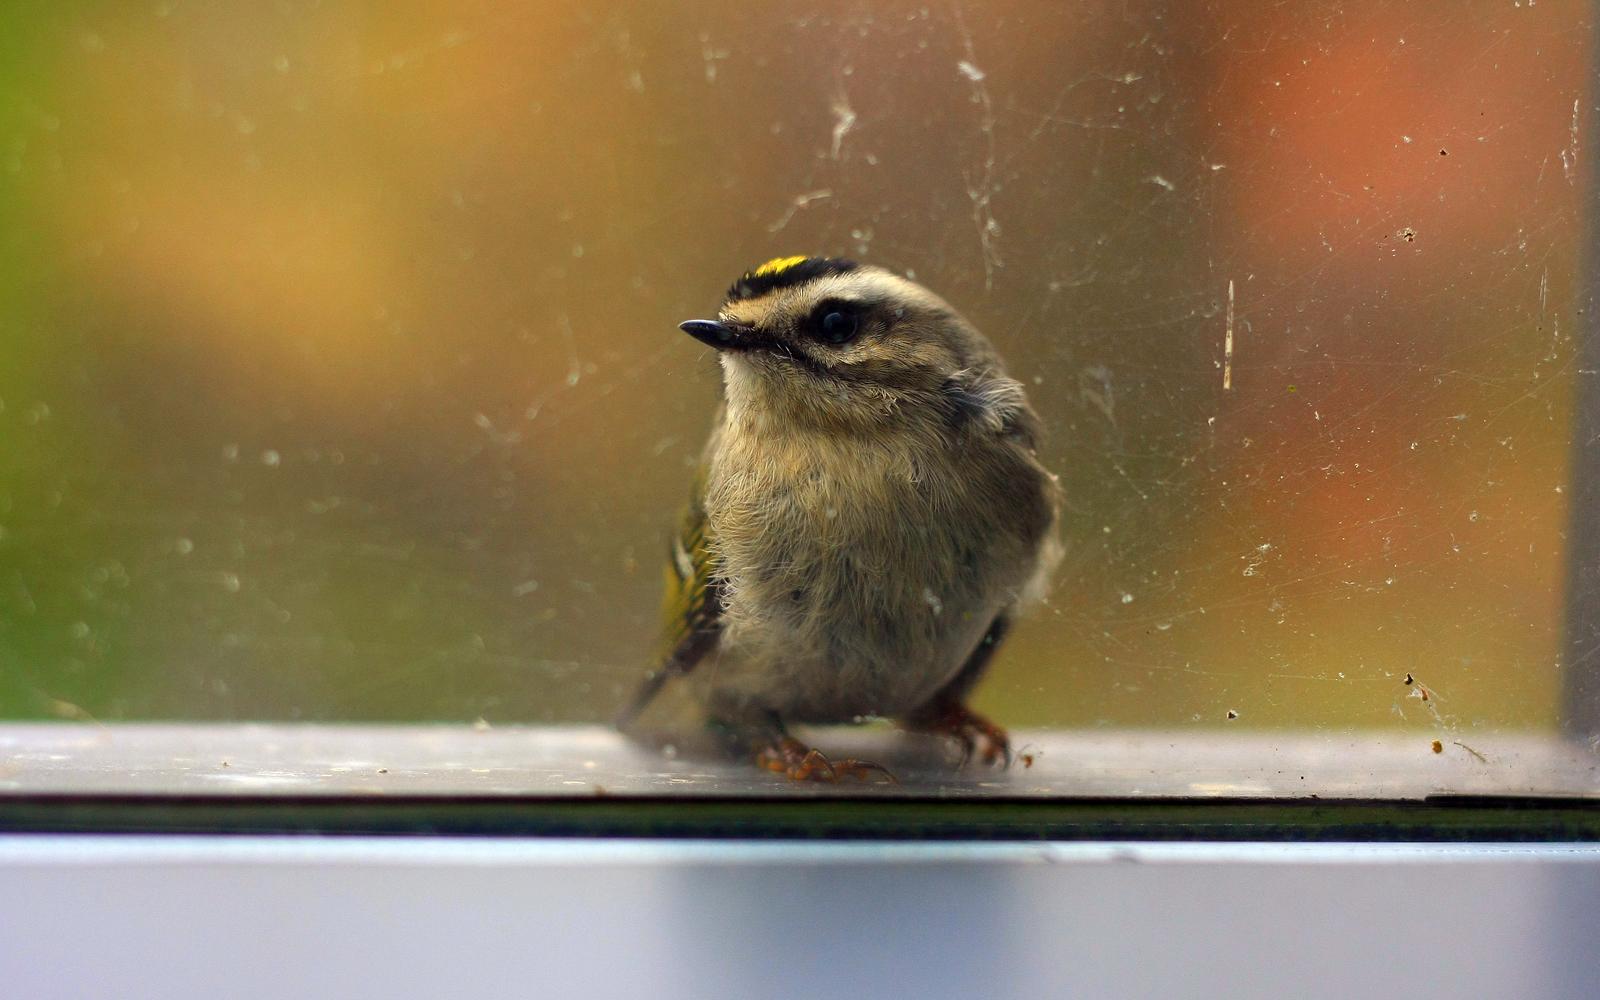 How To Bird-Proof Your Windows